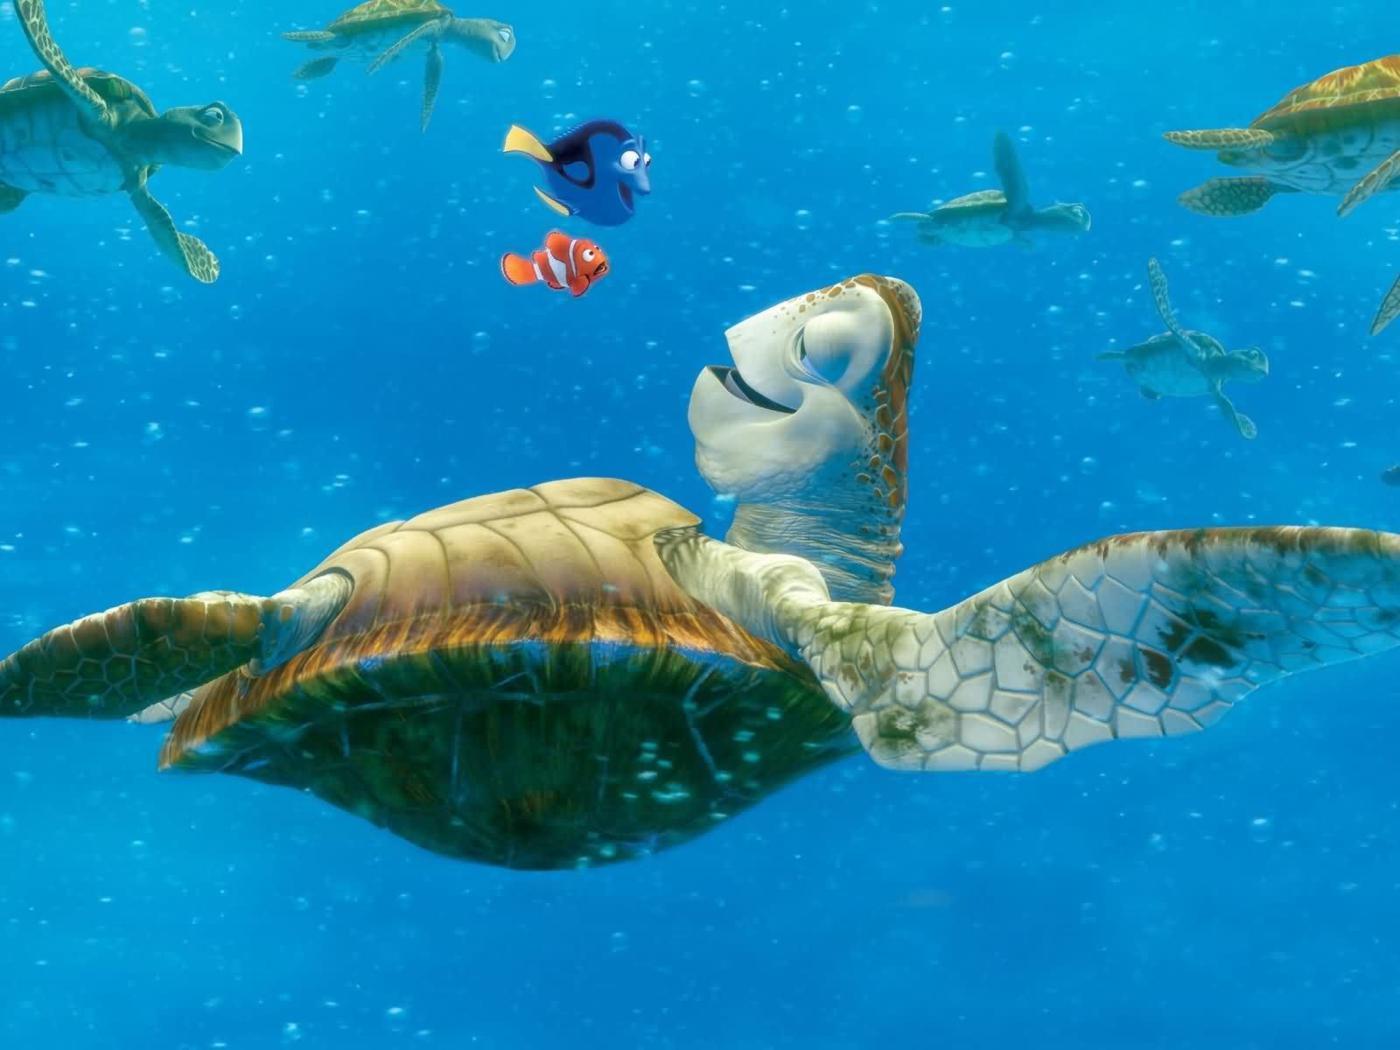 PC Wallpapers   Finding Nemo Movie Desktop Wallpaper Backgrounds 1400x1050